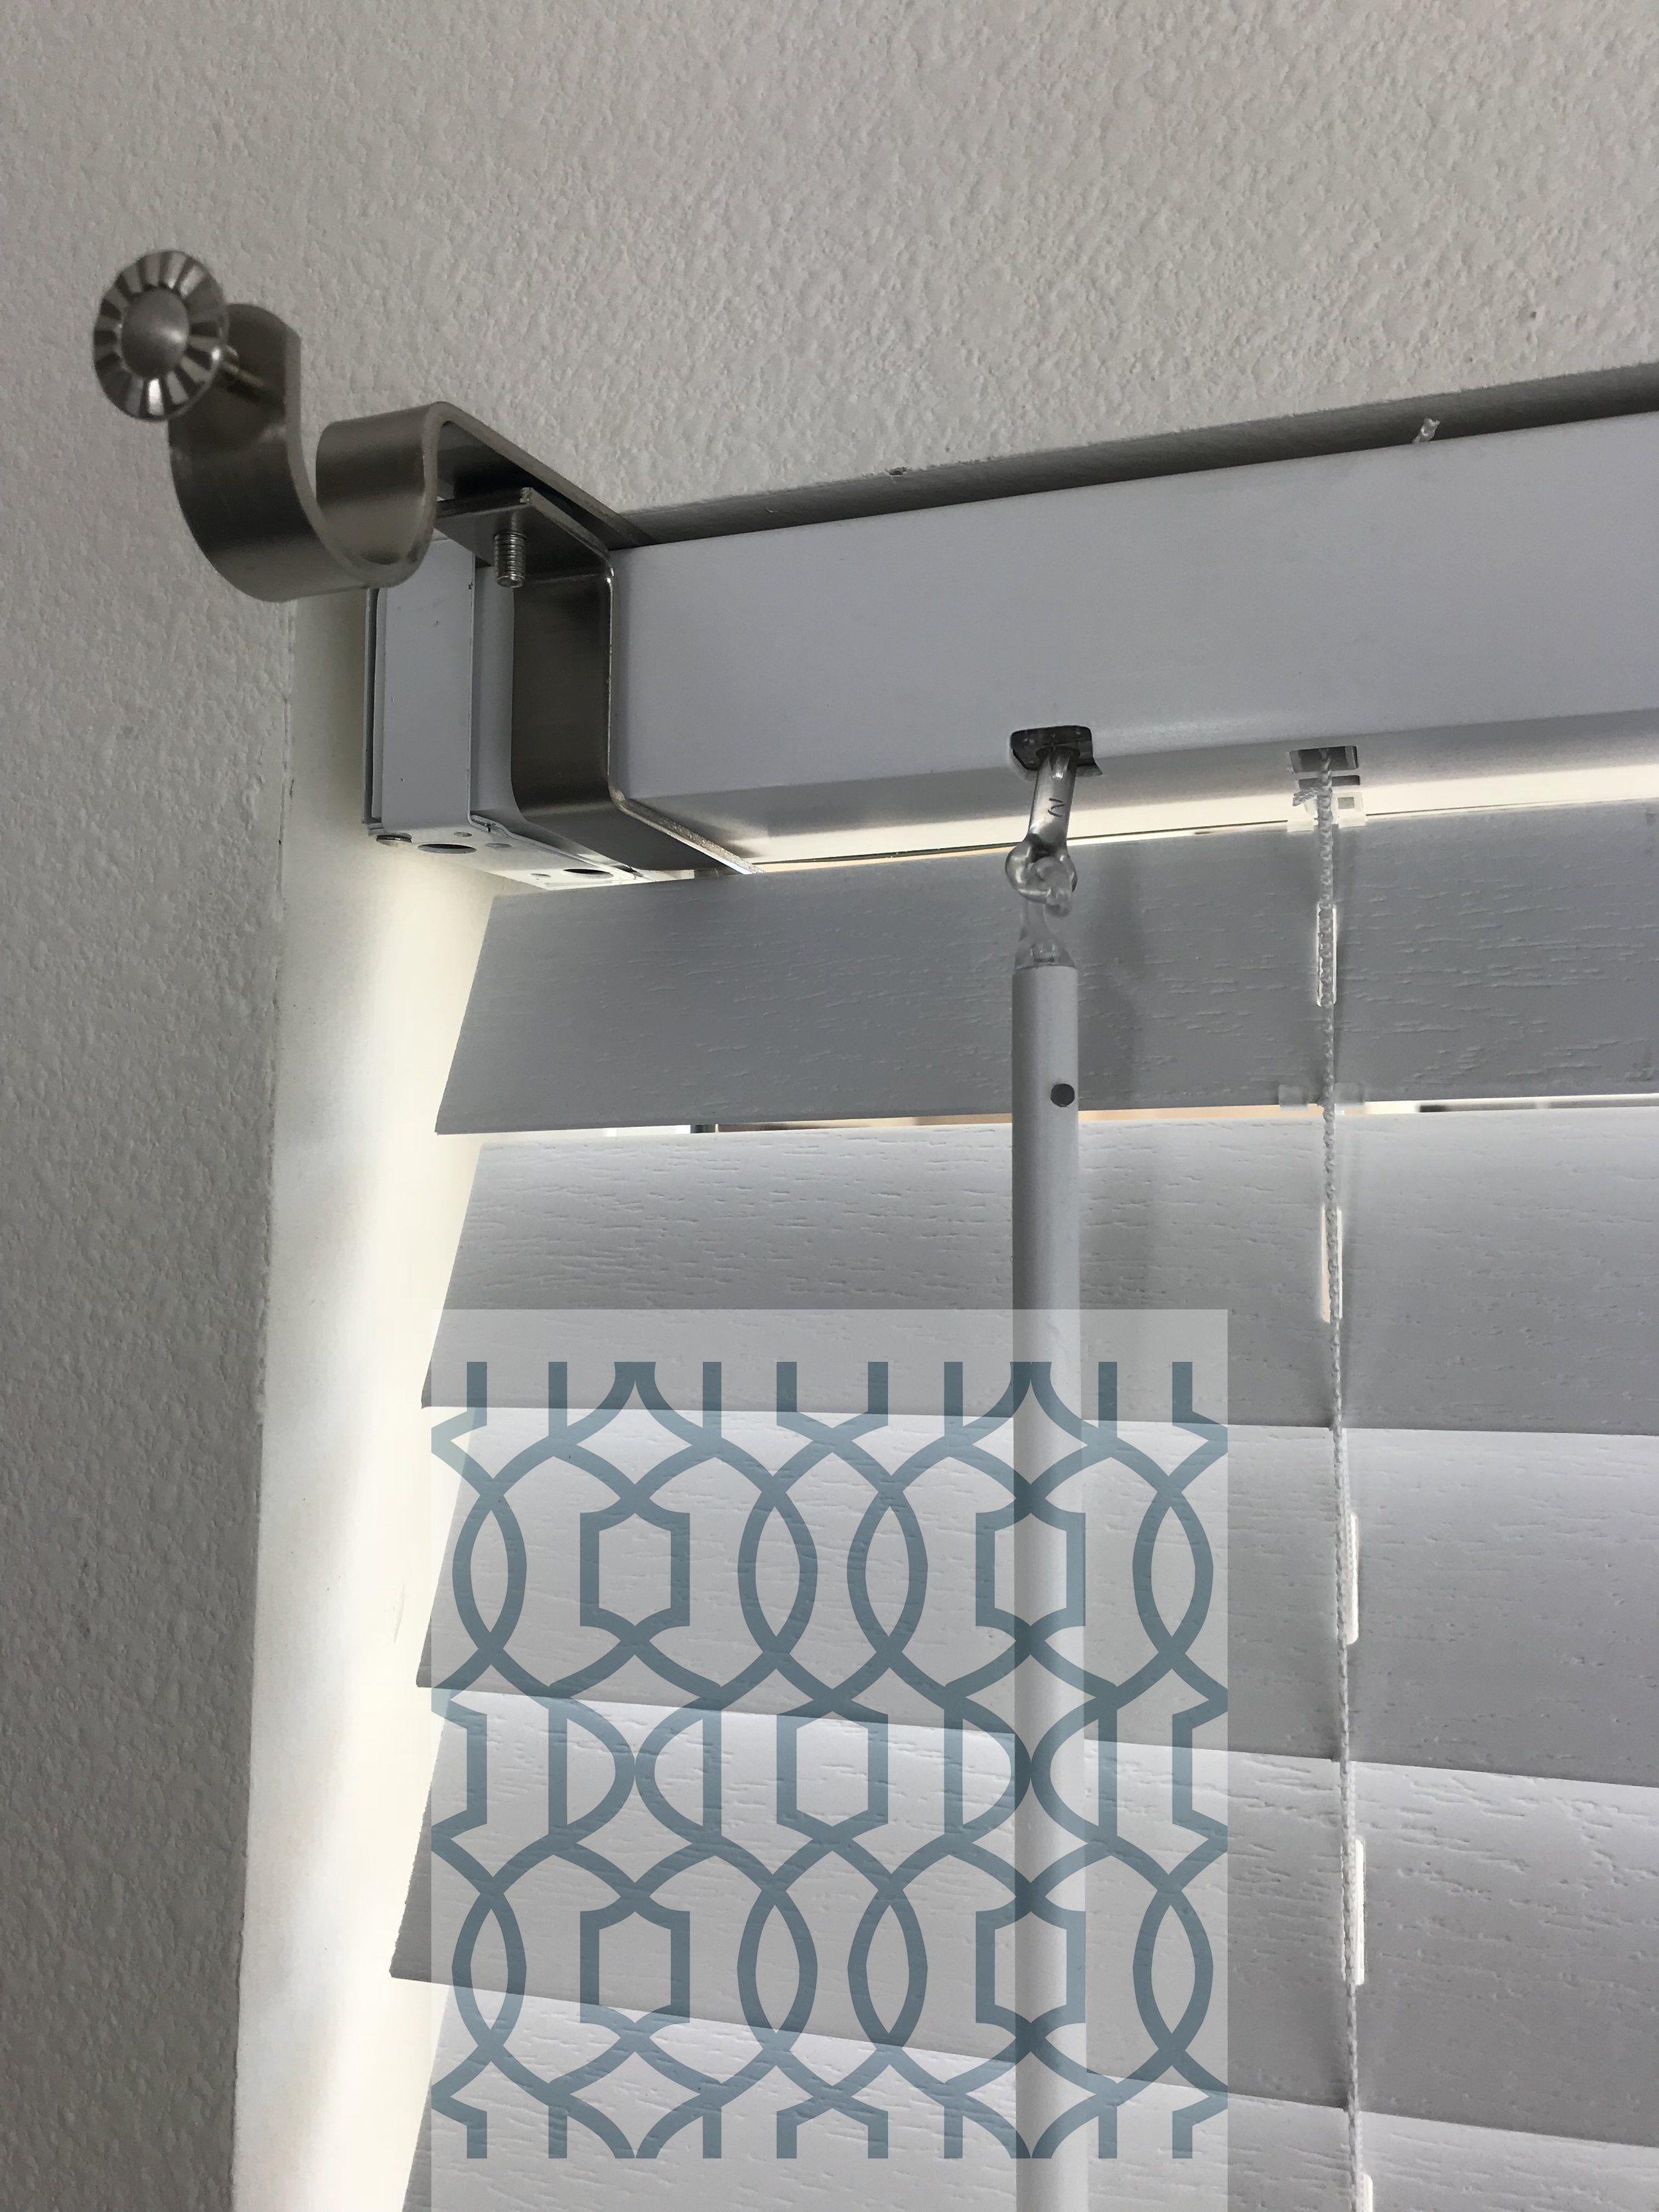 5 simple and impressive tricks living room blinds ikea living room rh pinterest com IKEA Bedrooms IKEA Furniture